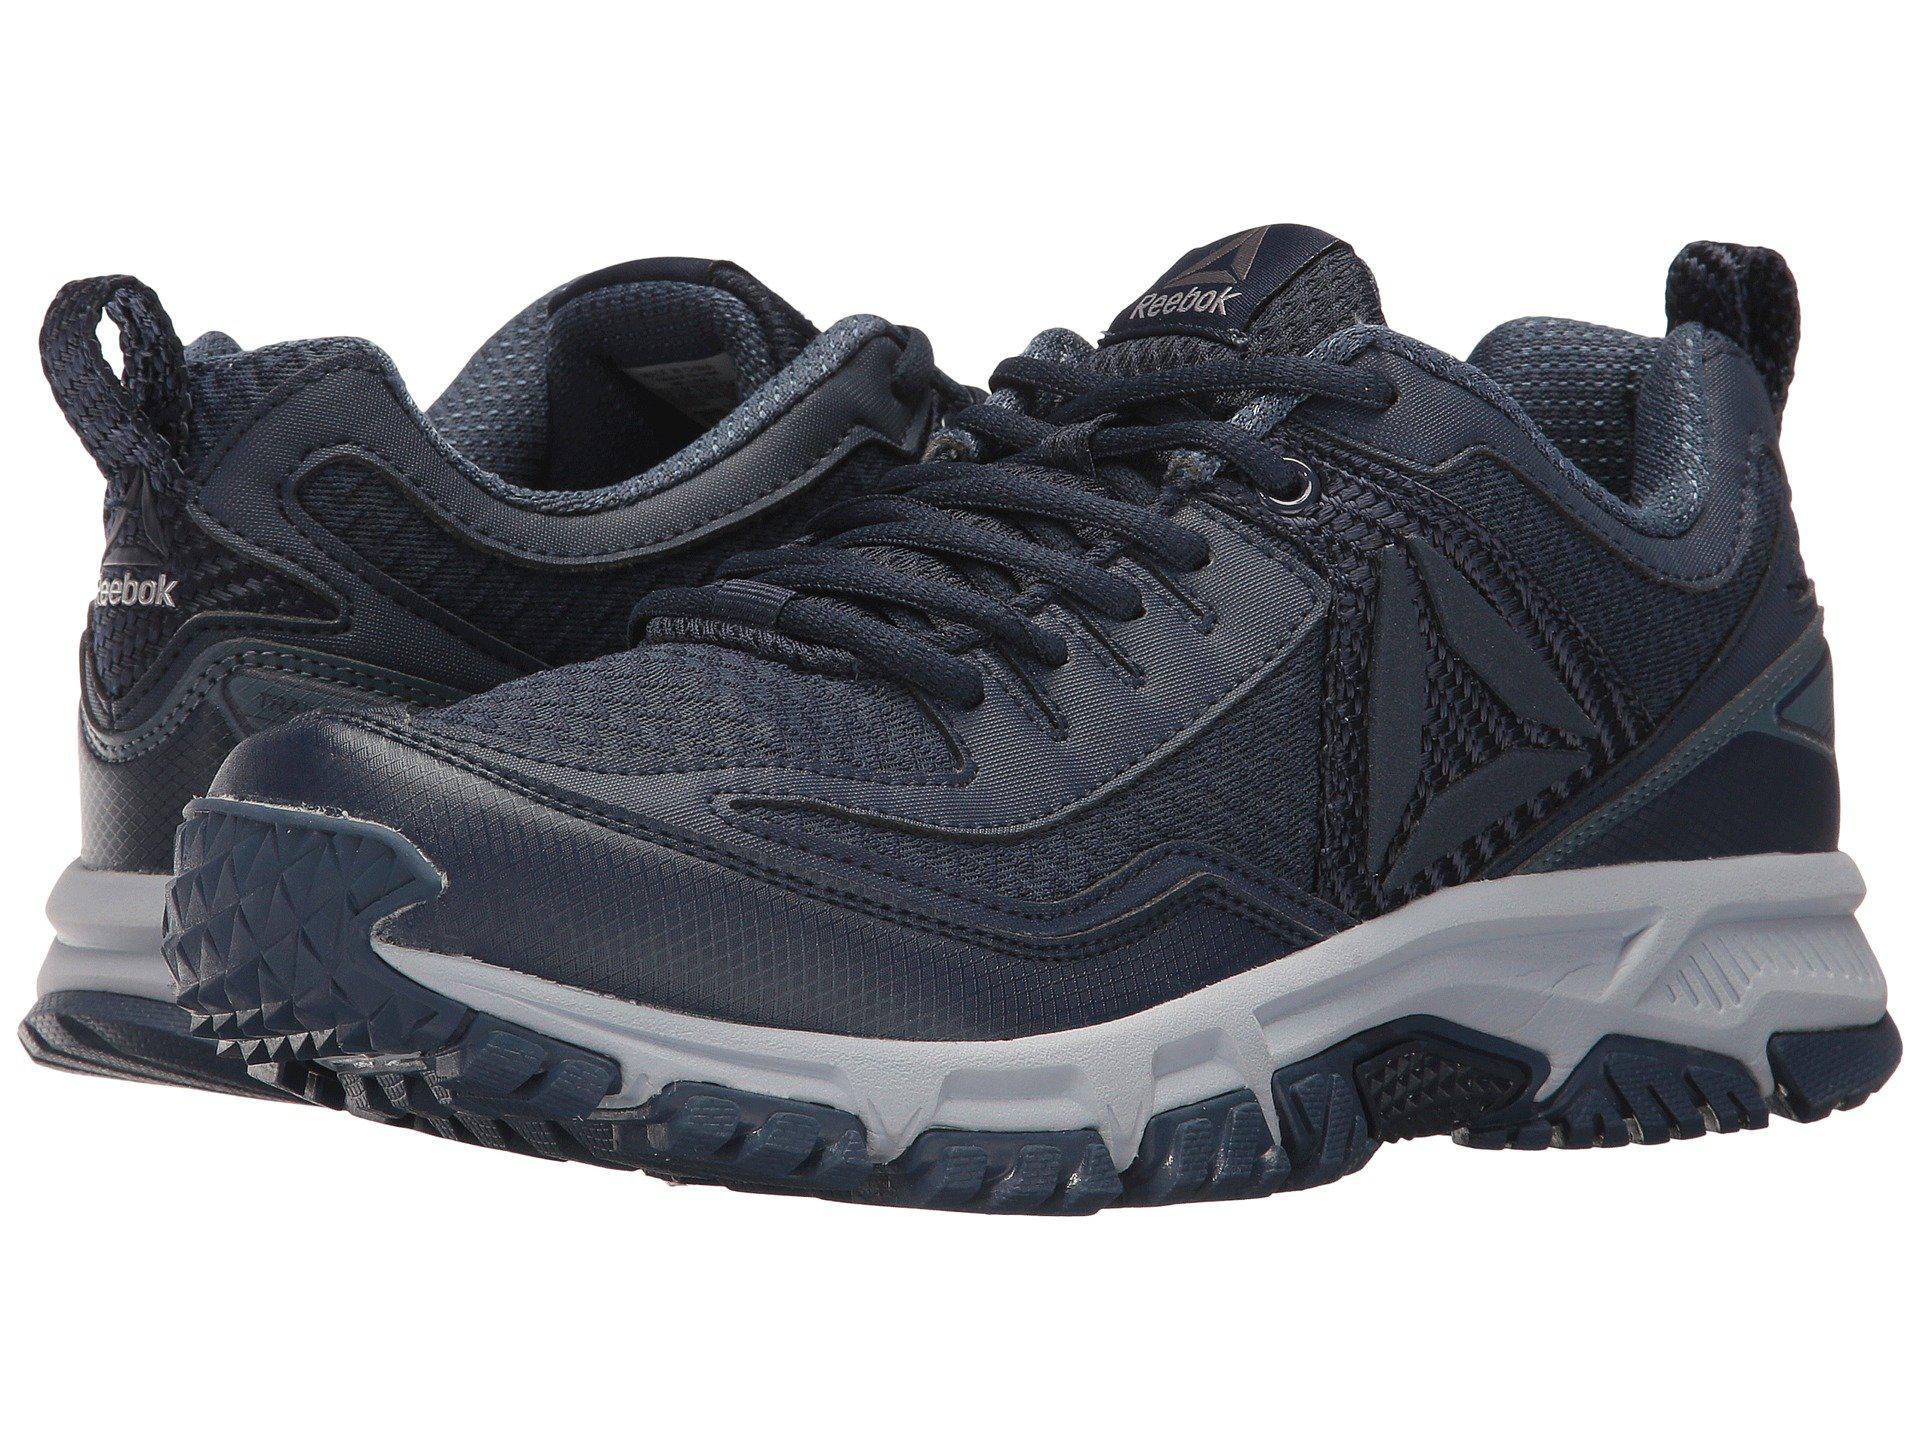 367cd03ff639 Lyst - Reebok Ridgerider Trail 2.0 in Blue for Men